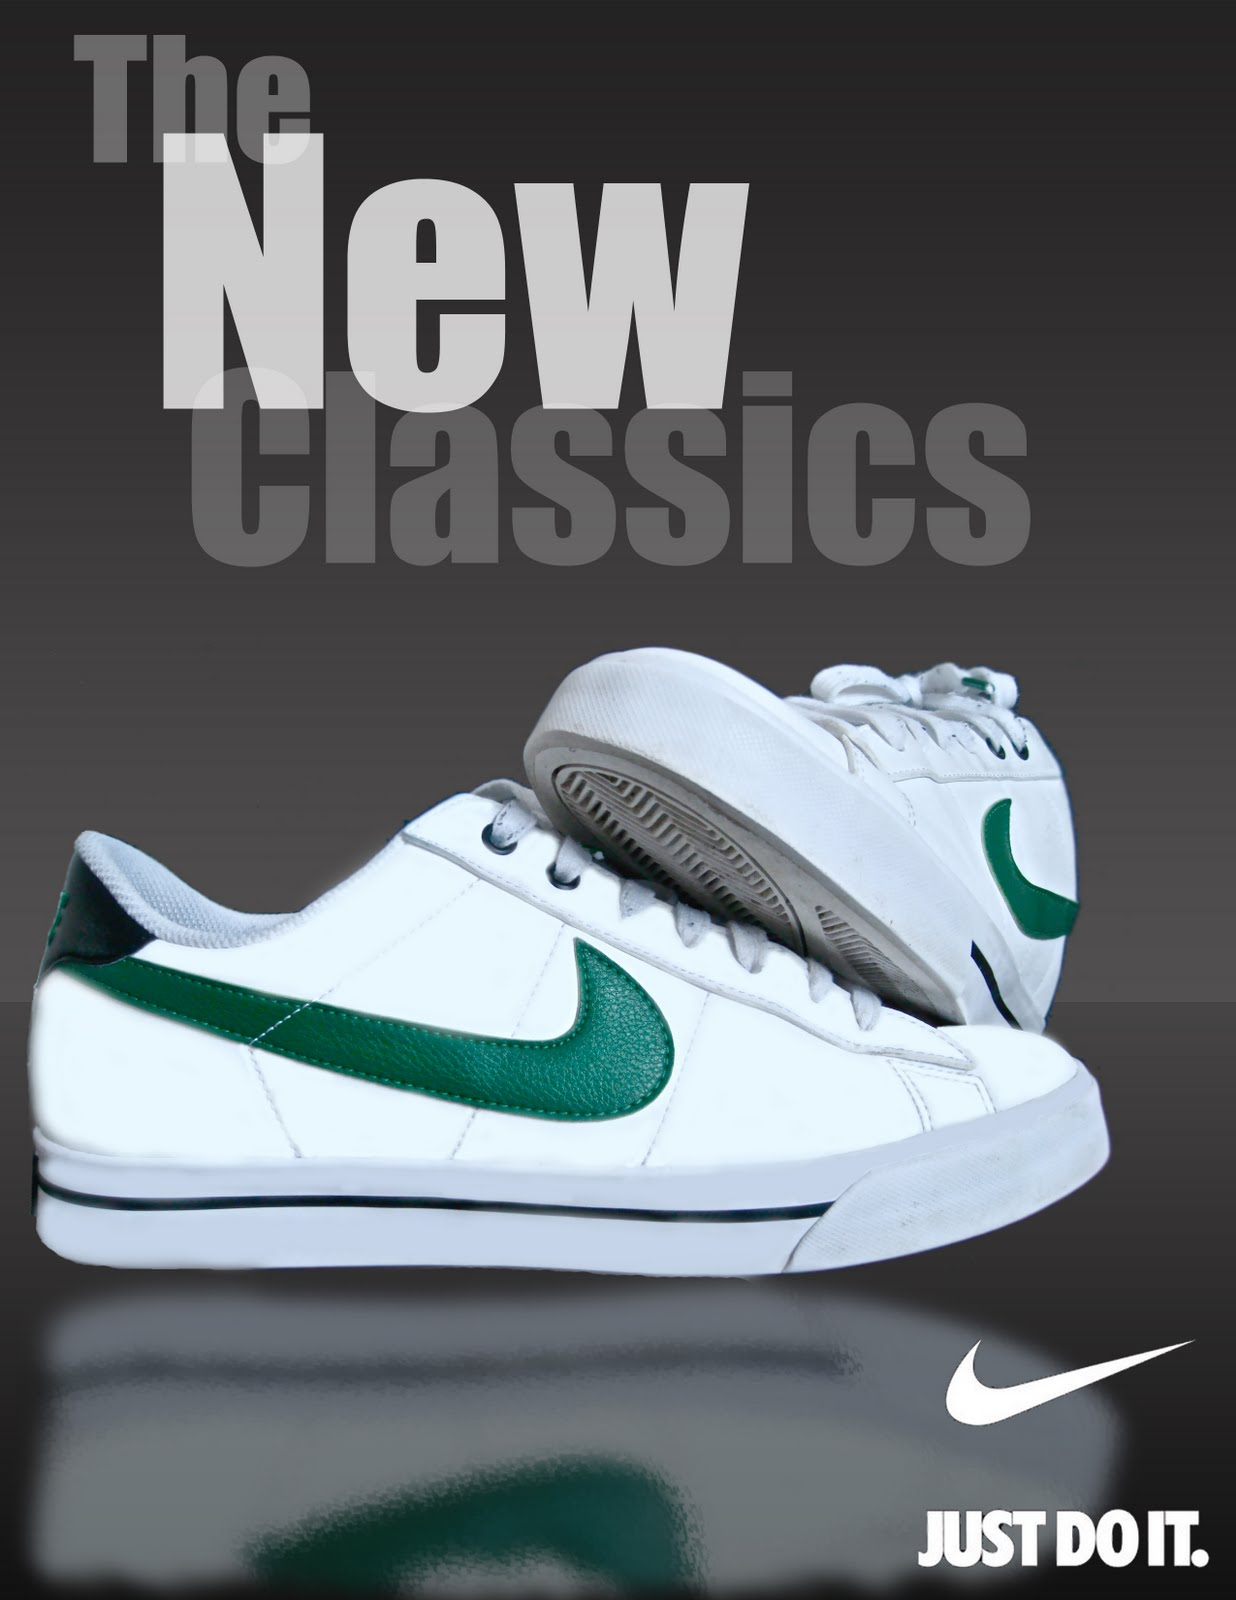 Gallery 91 Inc.: Nike Shoe Magazine Advertisement